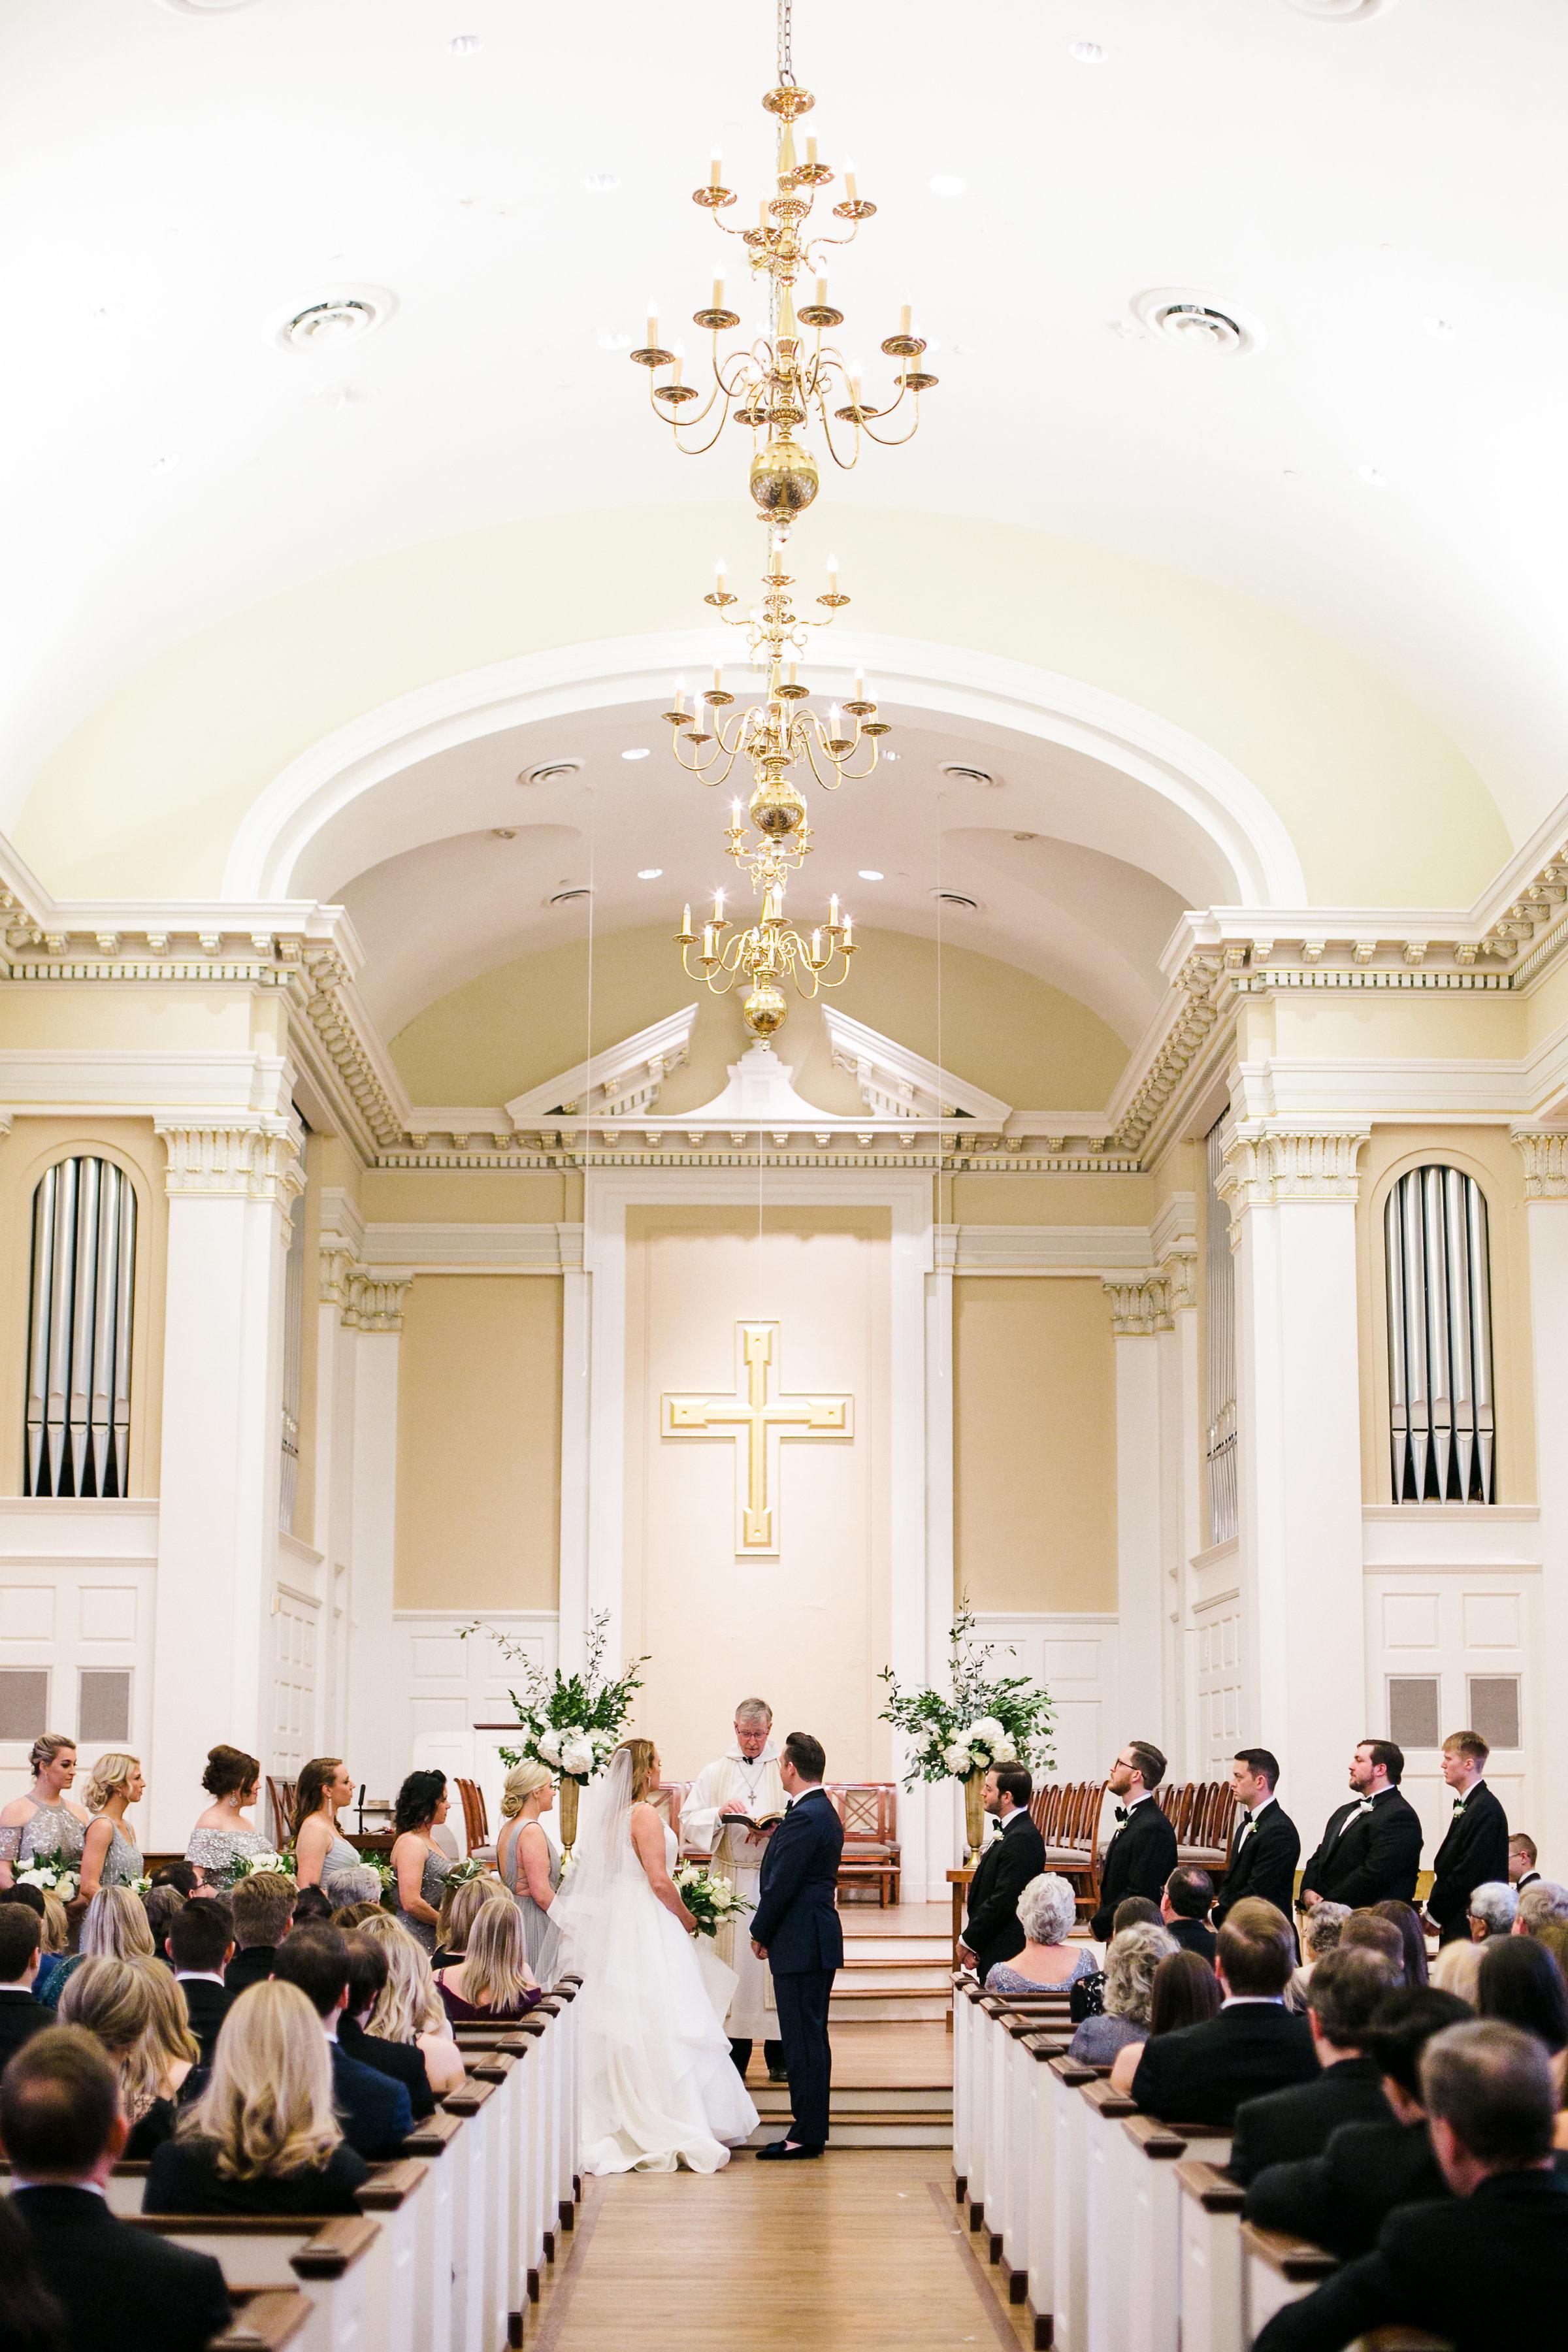 Ceremony Details - Dallas, Texas - Winter Wedding - Julian Leaver Events